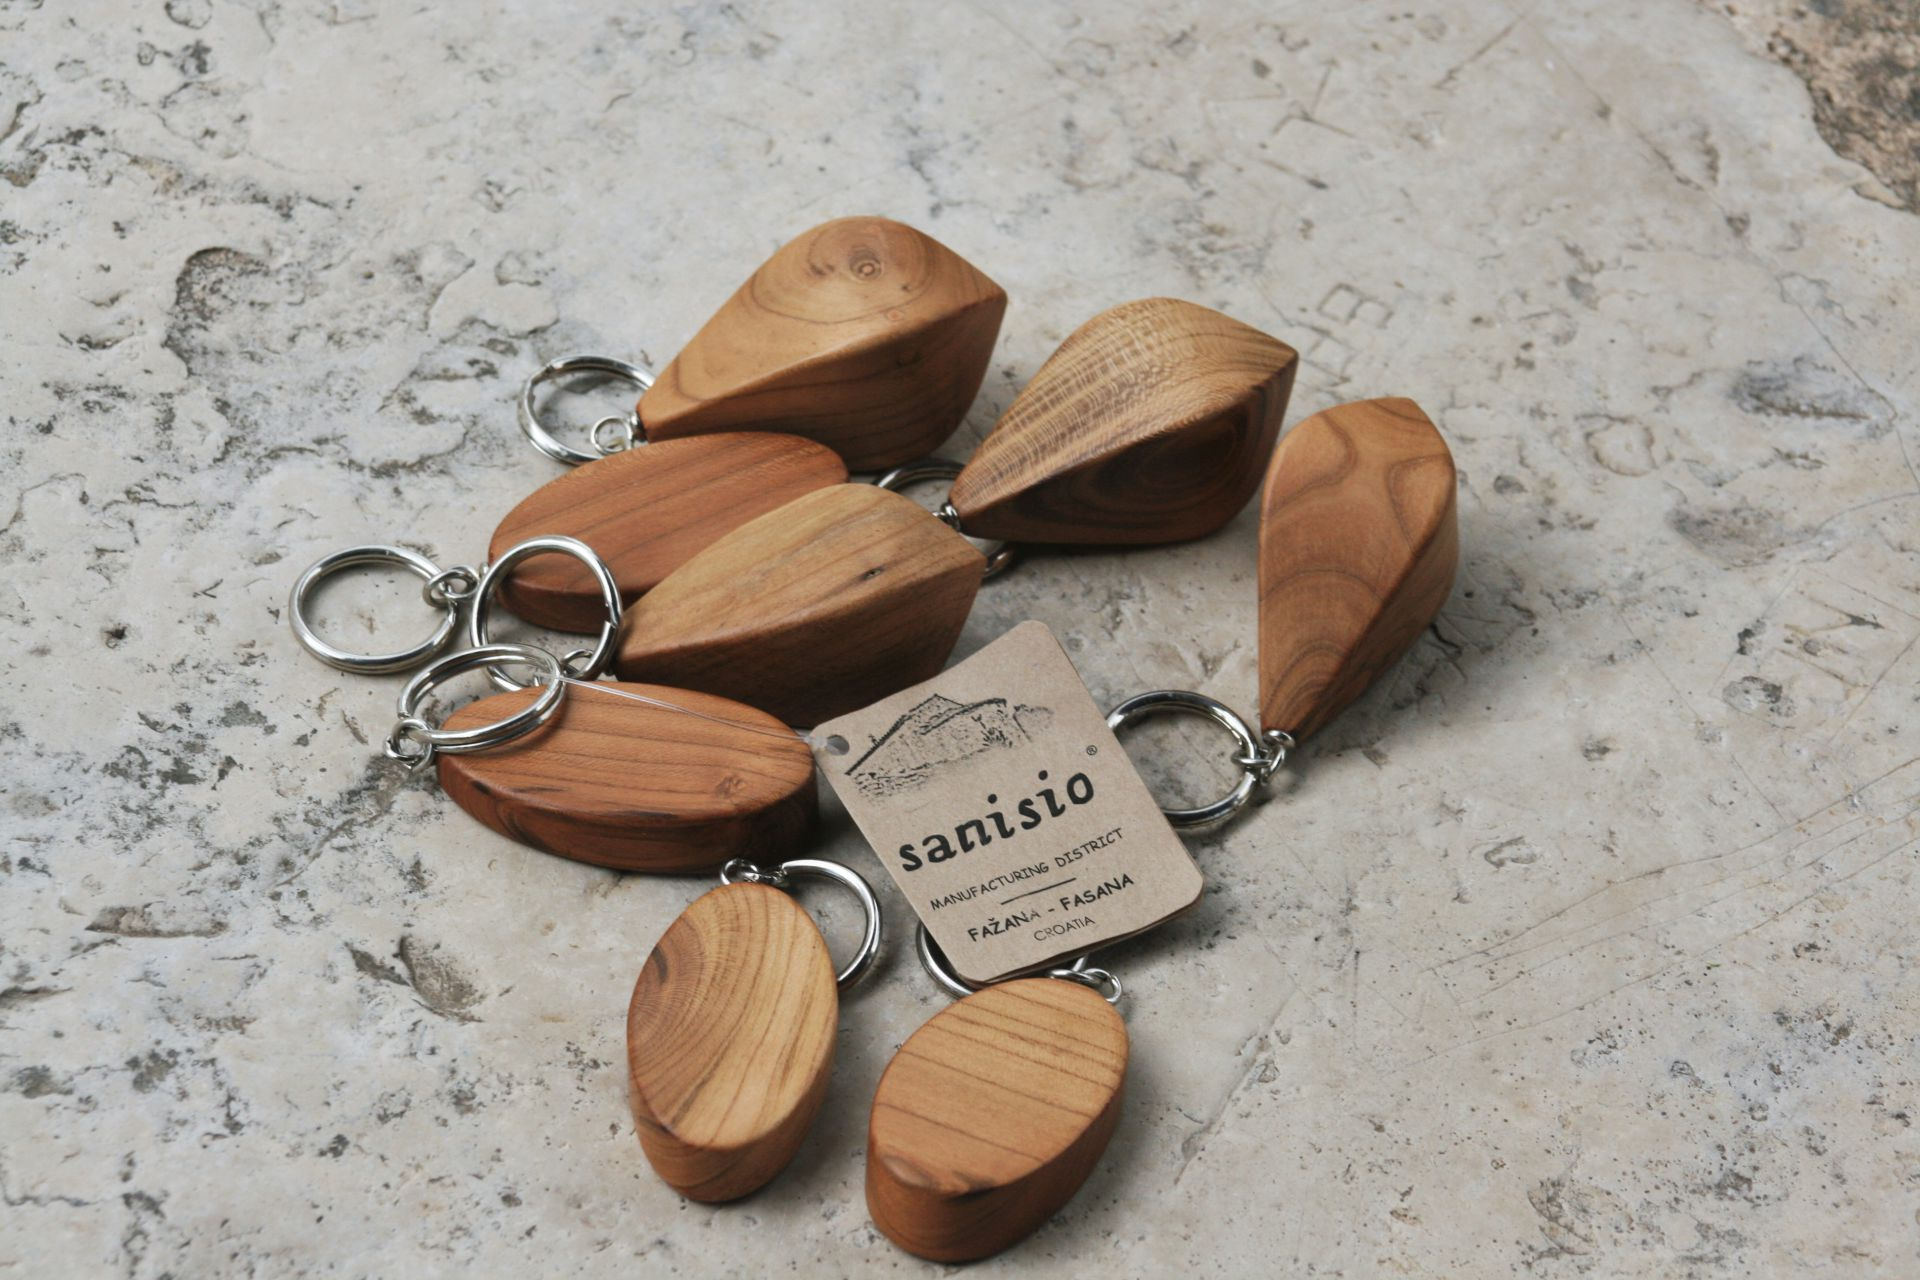 apricot wood key rings car keys unique handmade sanisio artist design